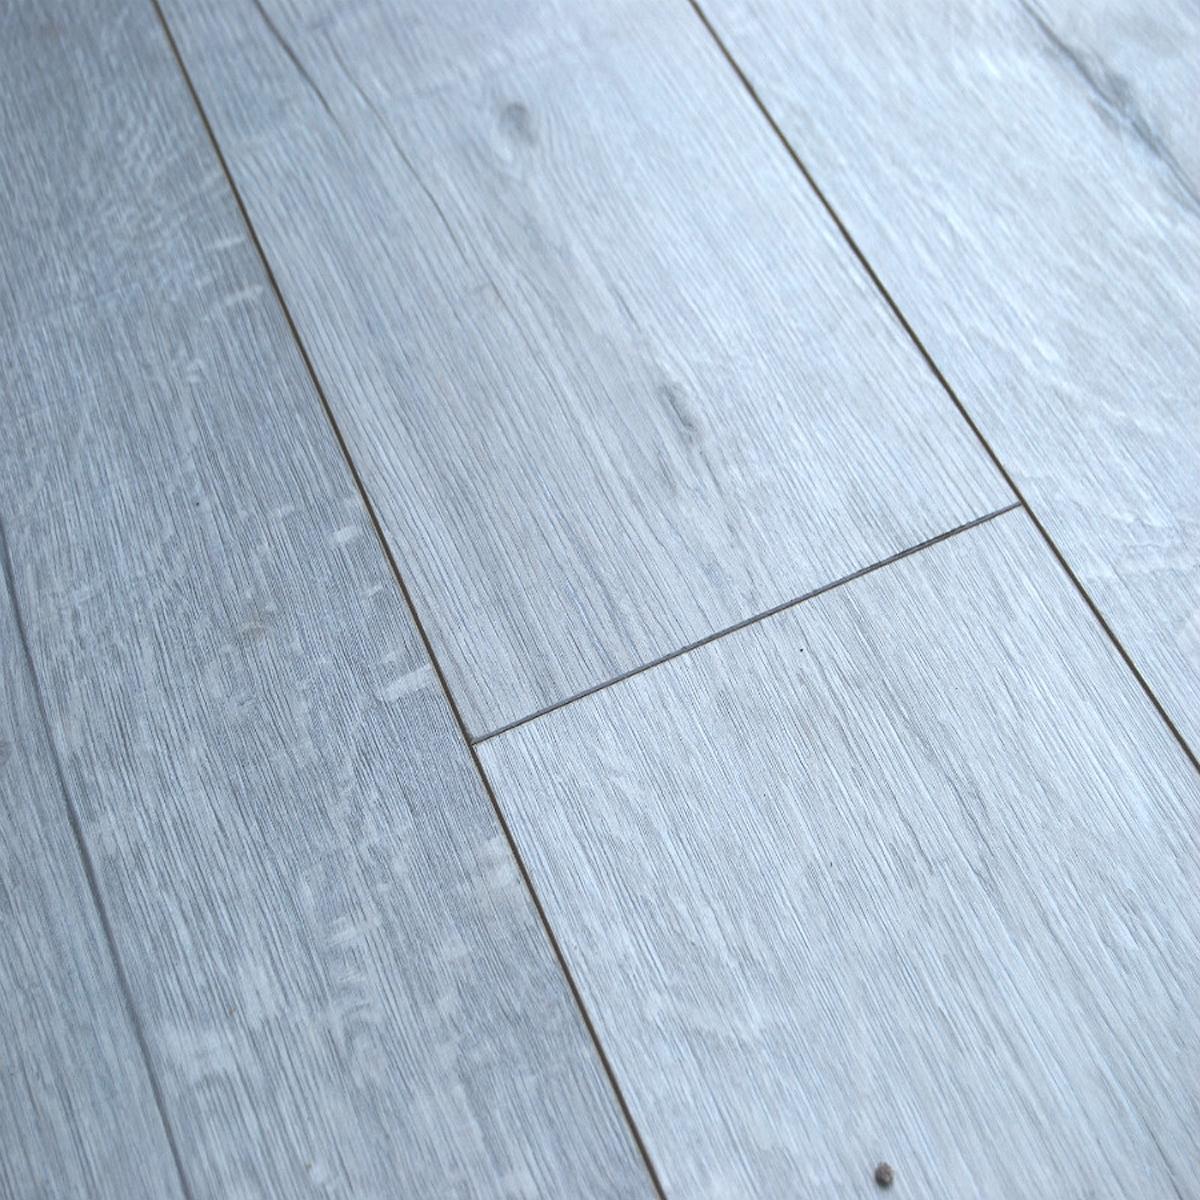 White Laminate Flooring Kronotex Rift, Blue Gray Laminate Flooring